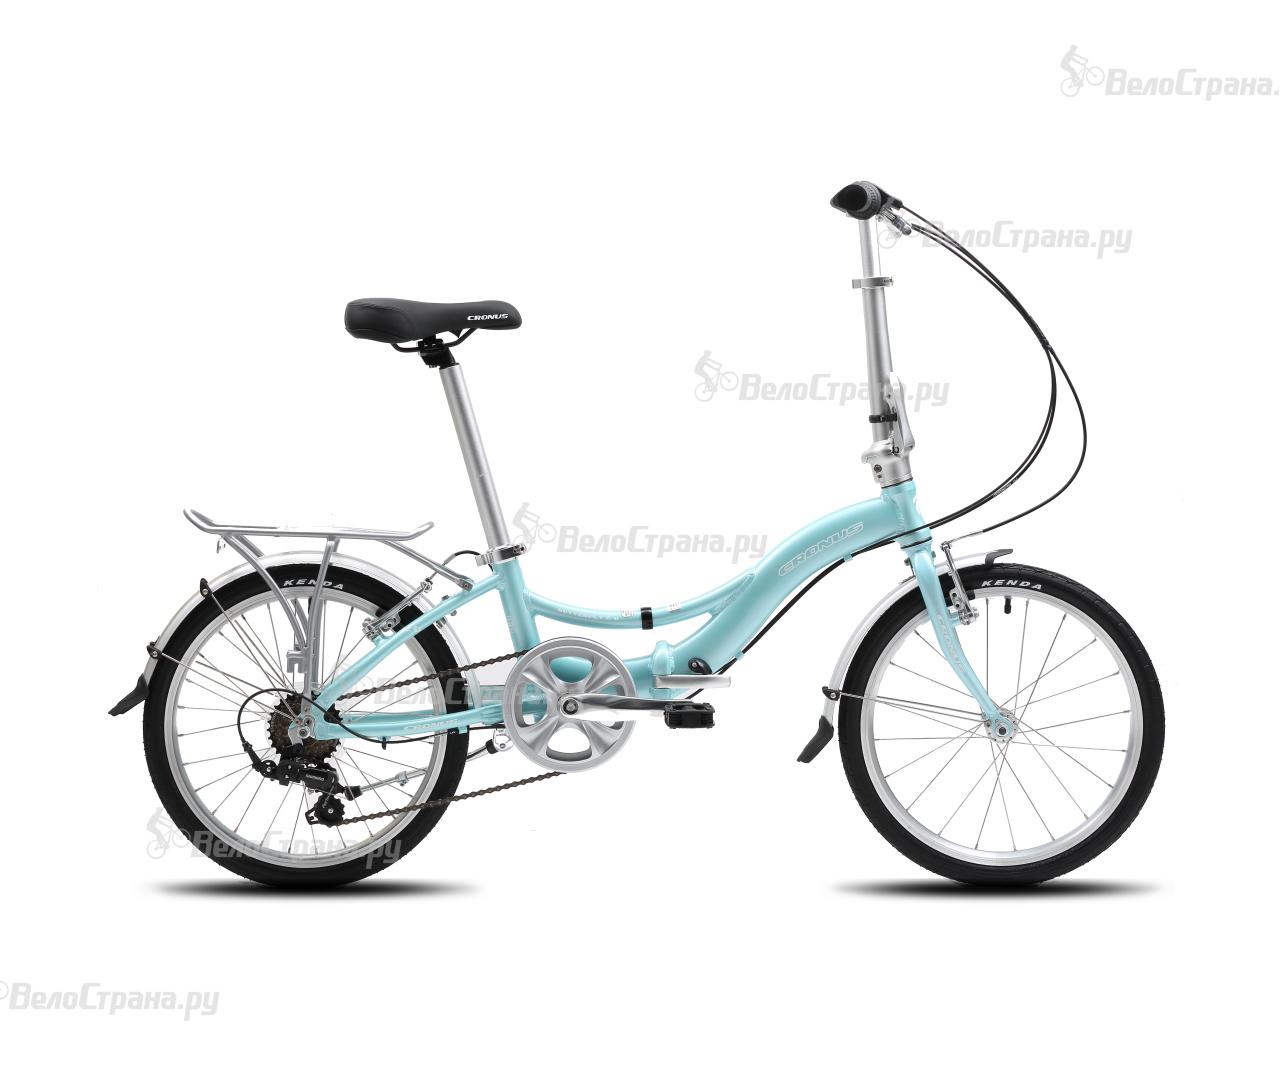 Велосипед Cronus BUTTERFLY 2.0 20 (2017) the skin house wrinkle system eye cream крем для глаз от мимических морщин с коллагеном 40гр